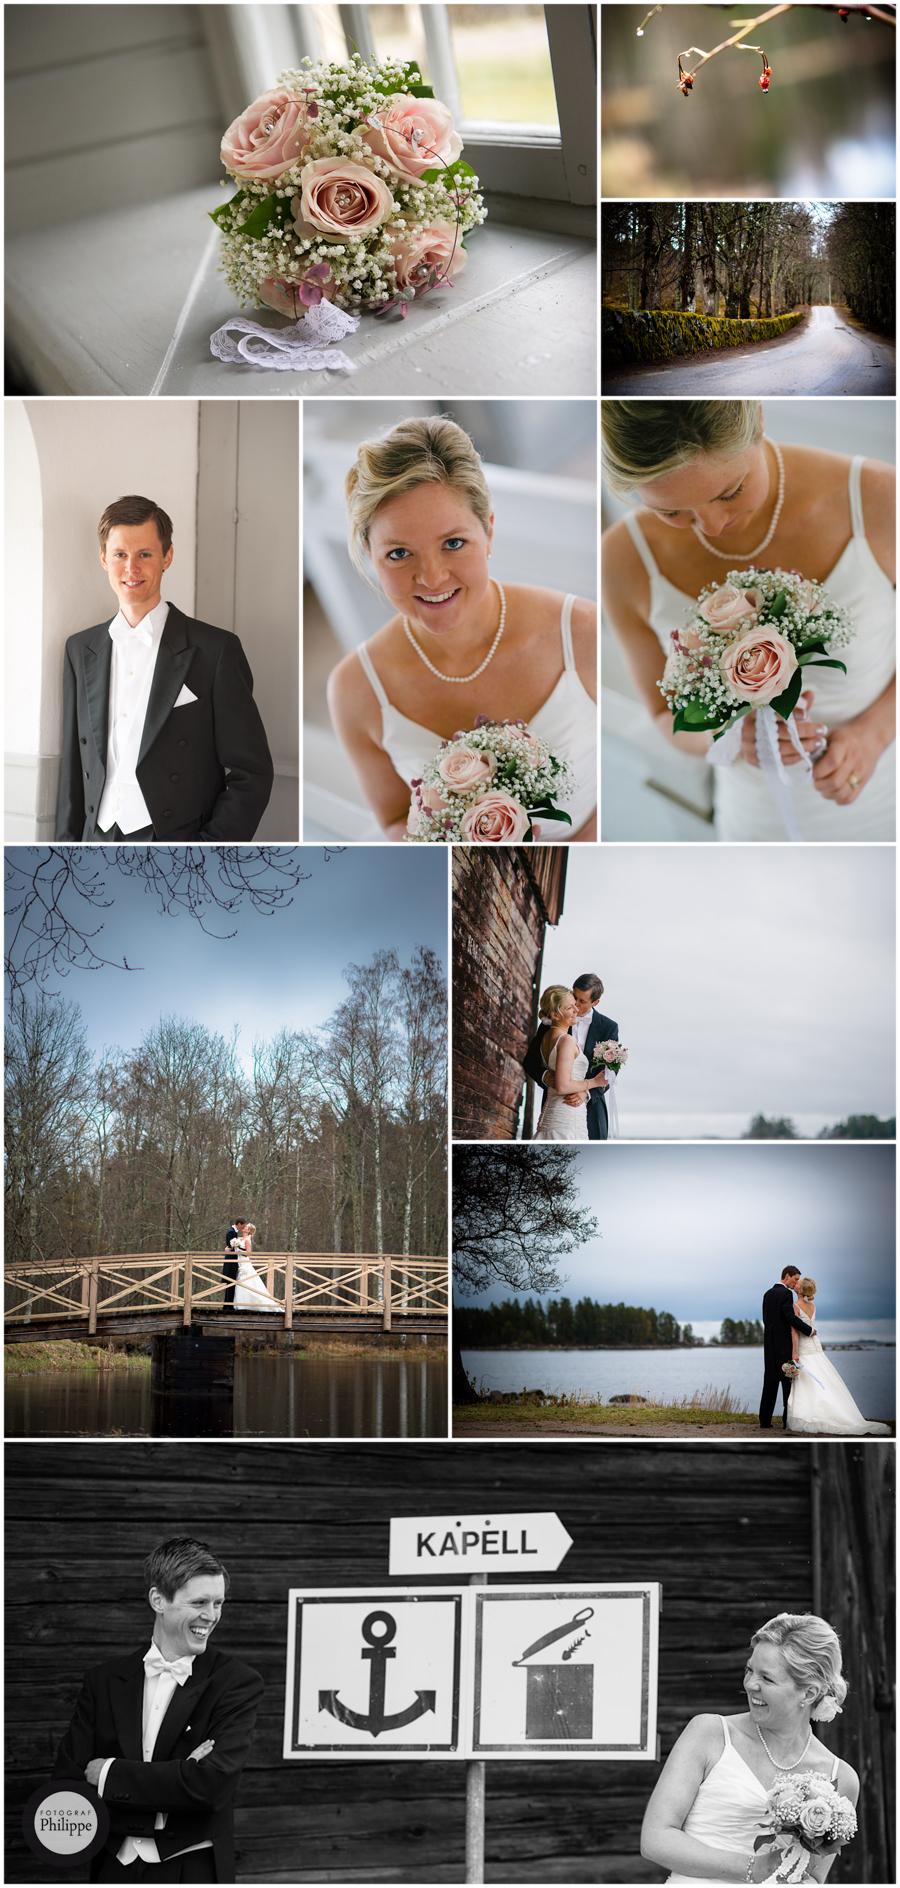 Fotograf Philippe Rendu - Bröllop på Långvinds Bruk i Hälsingland 3